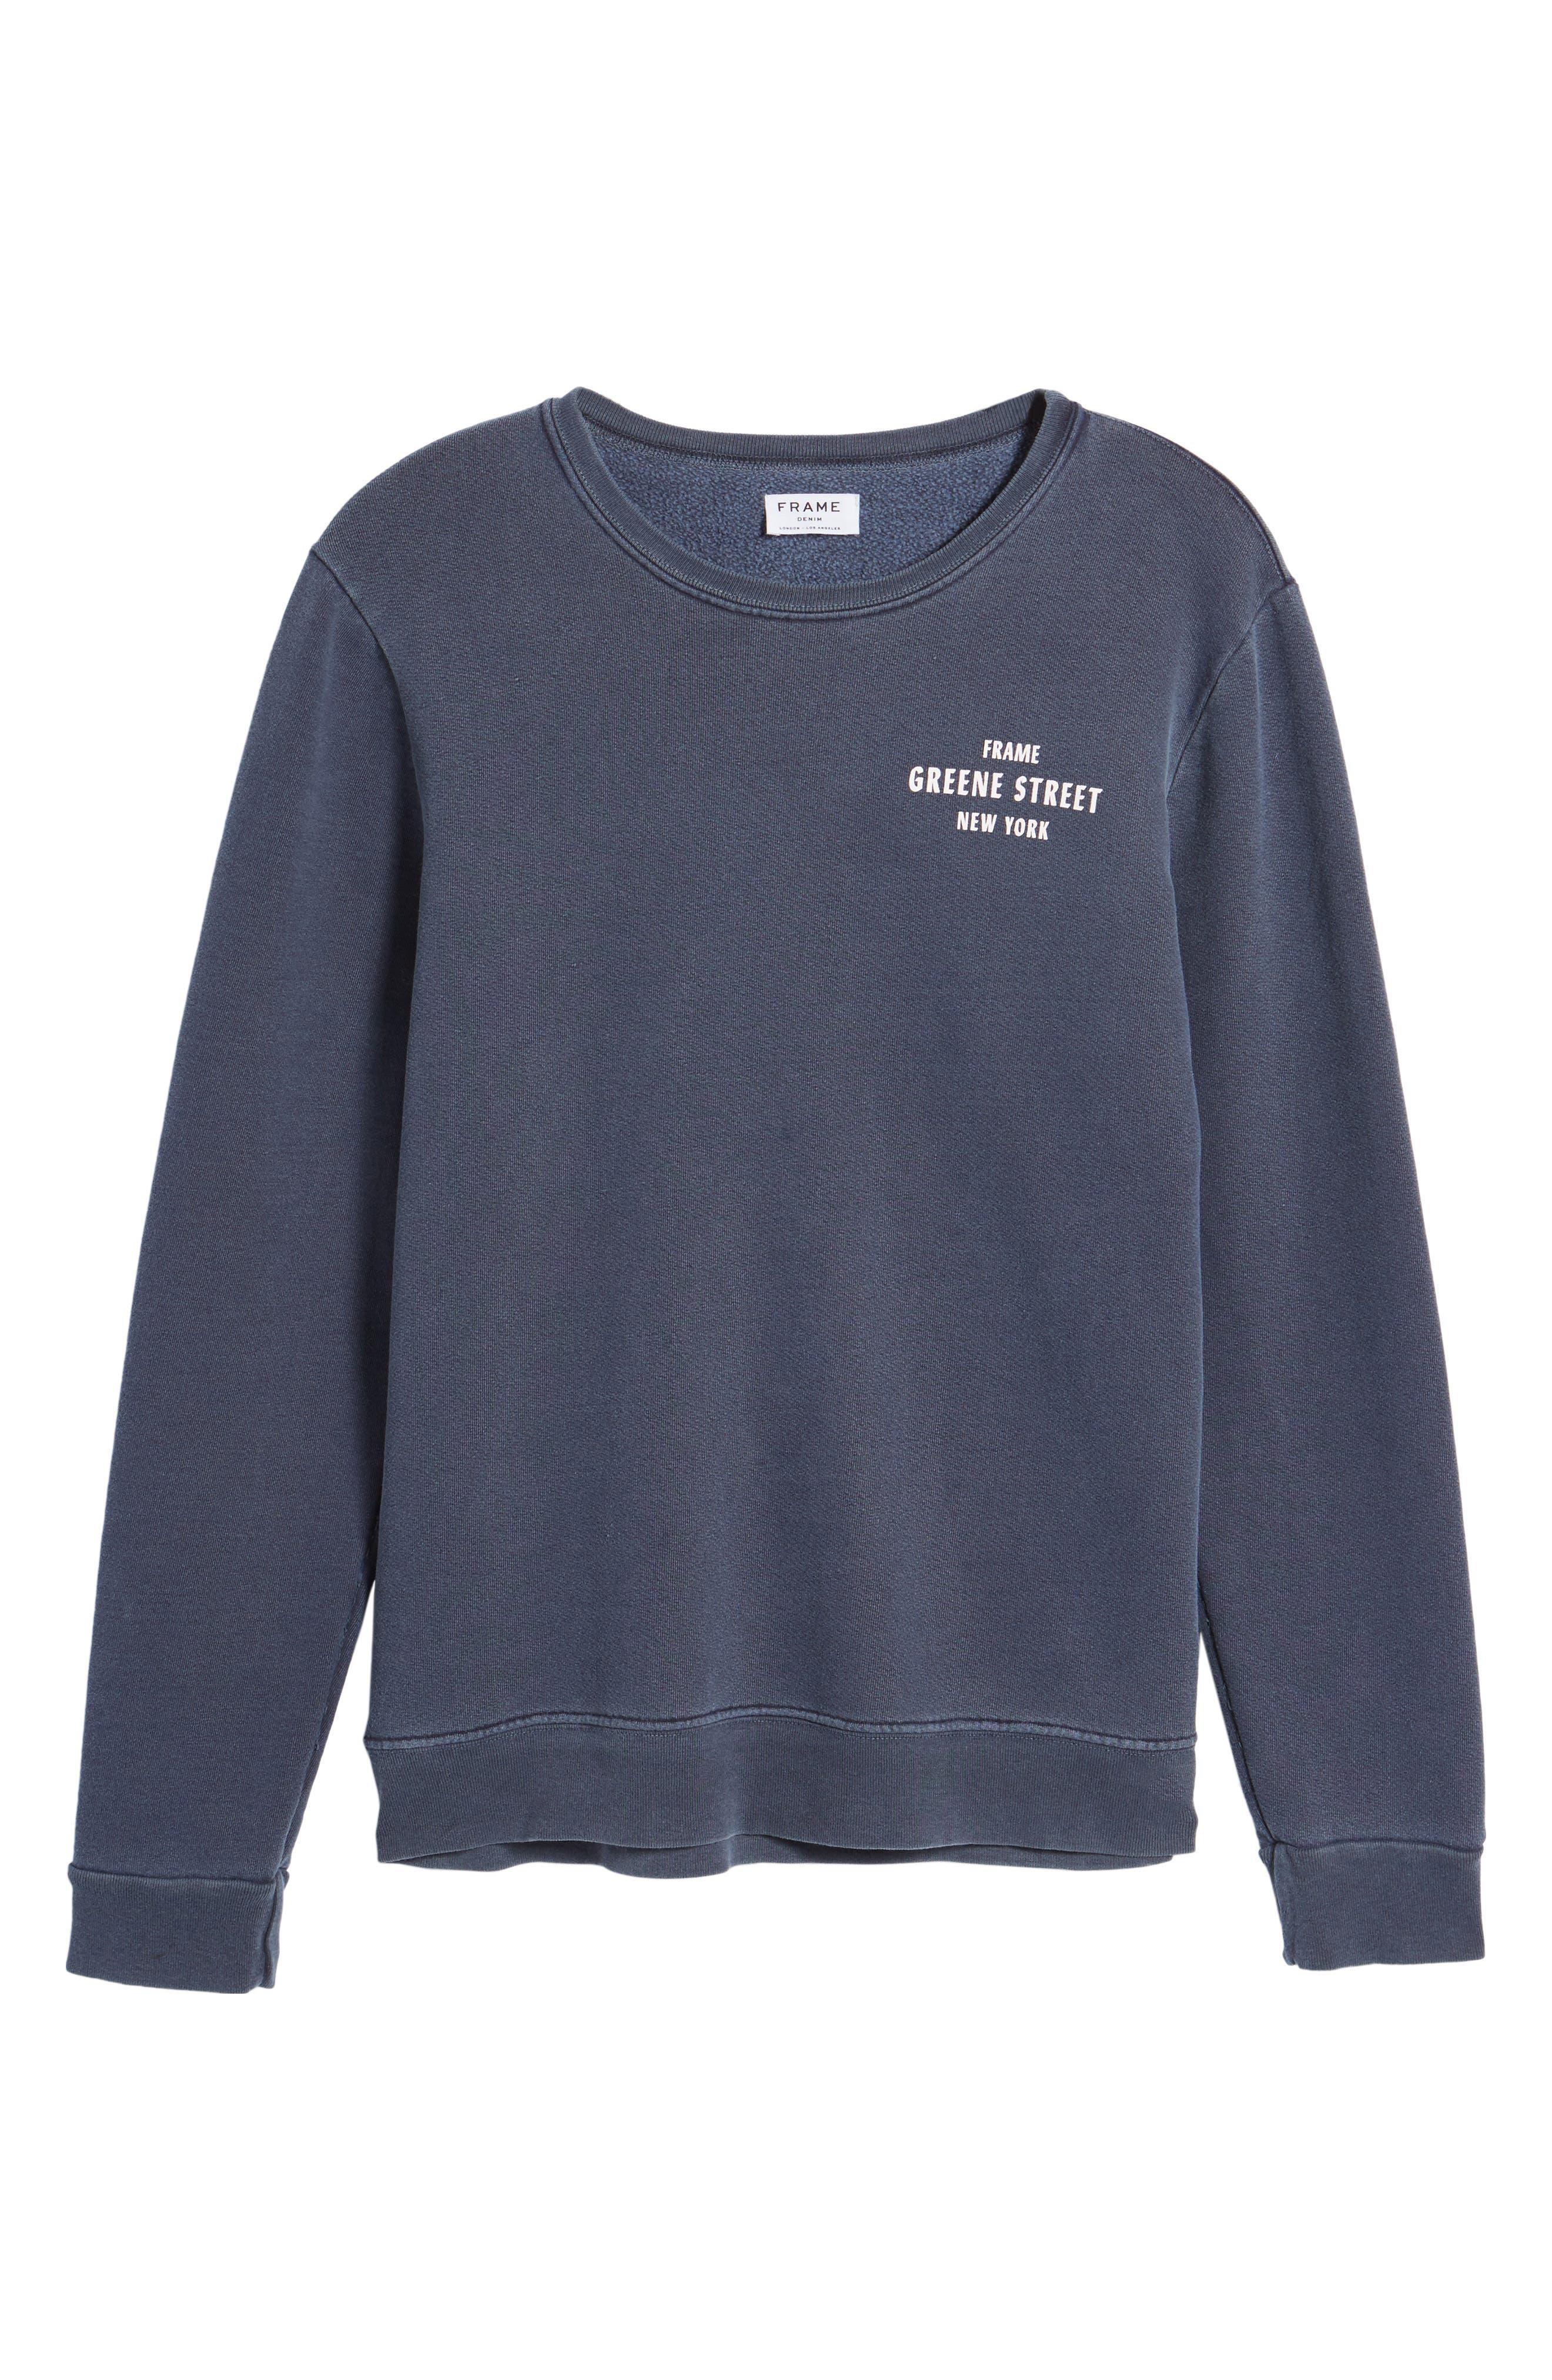 Vintage Crewneck Sweatshirt,                             Alternate thumbnail 17, color,